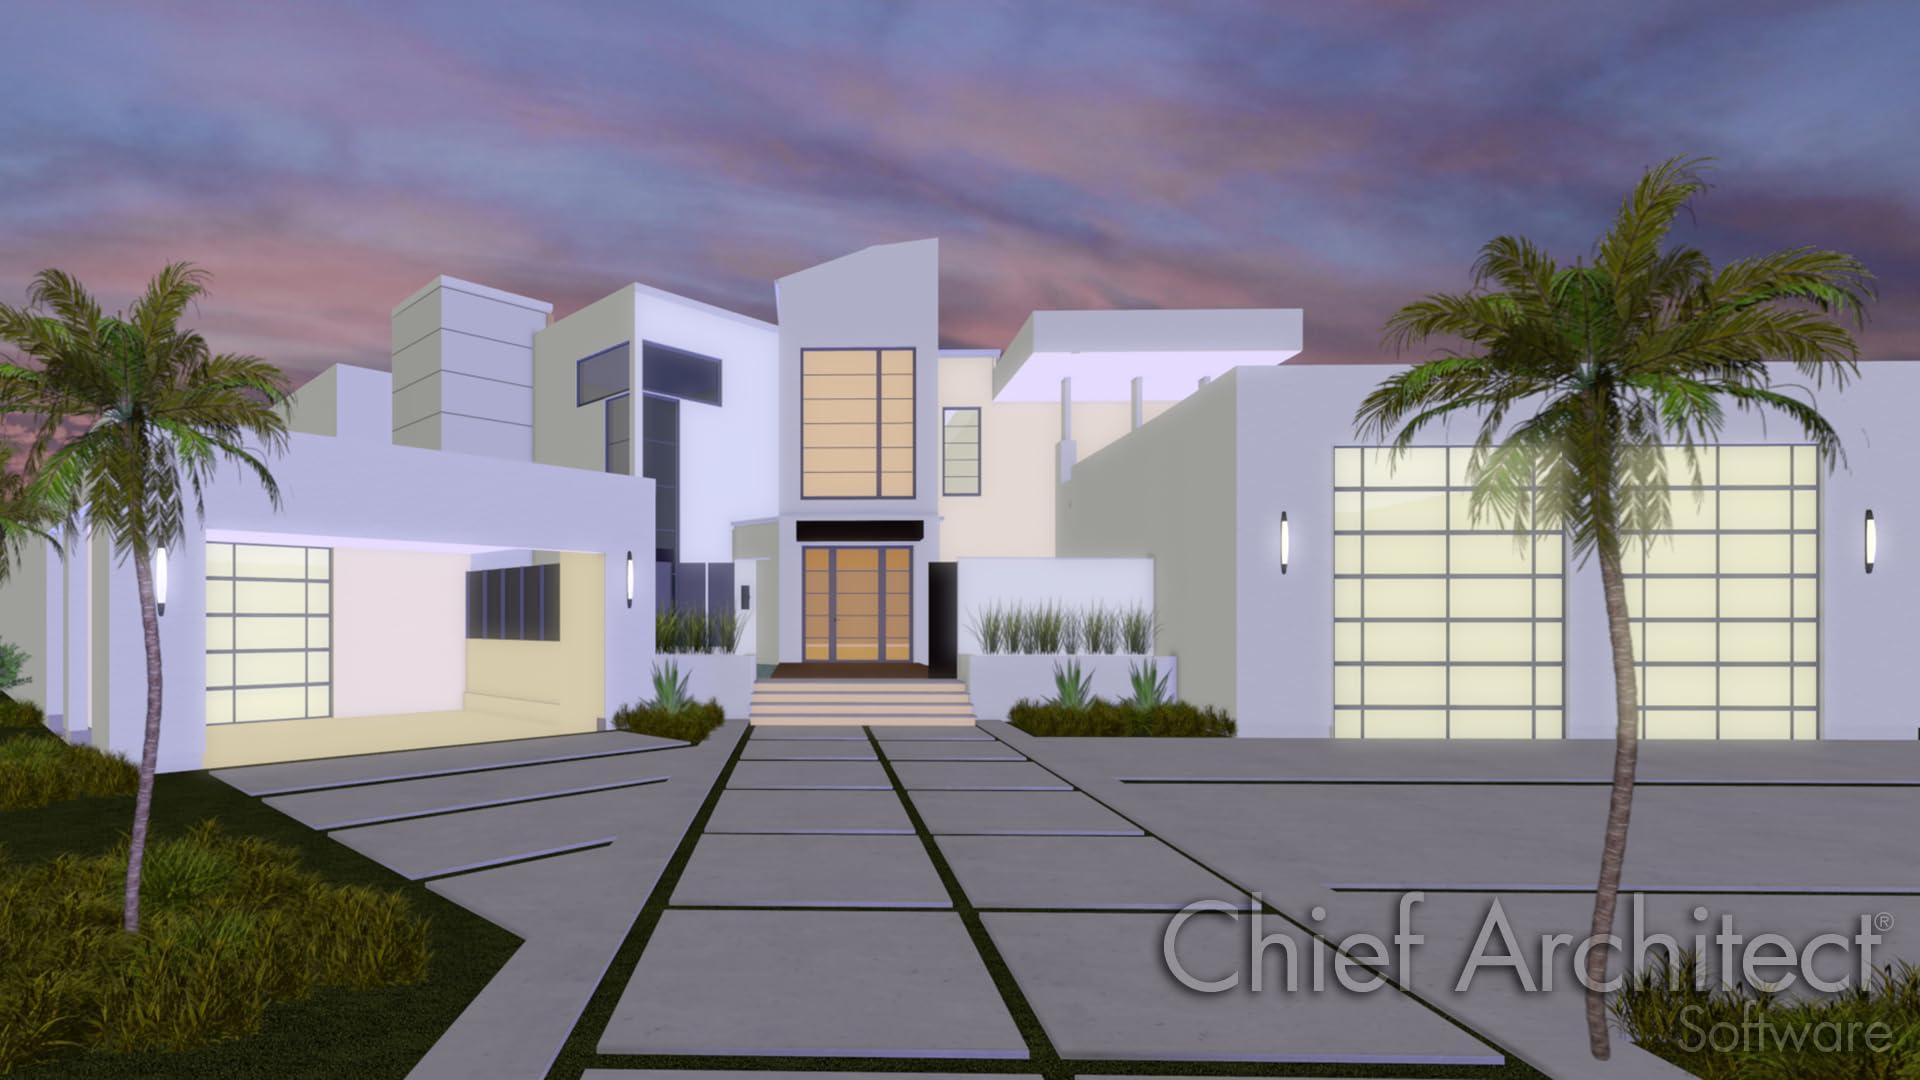 Home Designer Architectural 2019 Pc Download Download Software Amazon Com